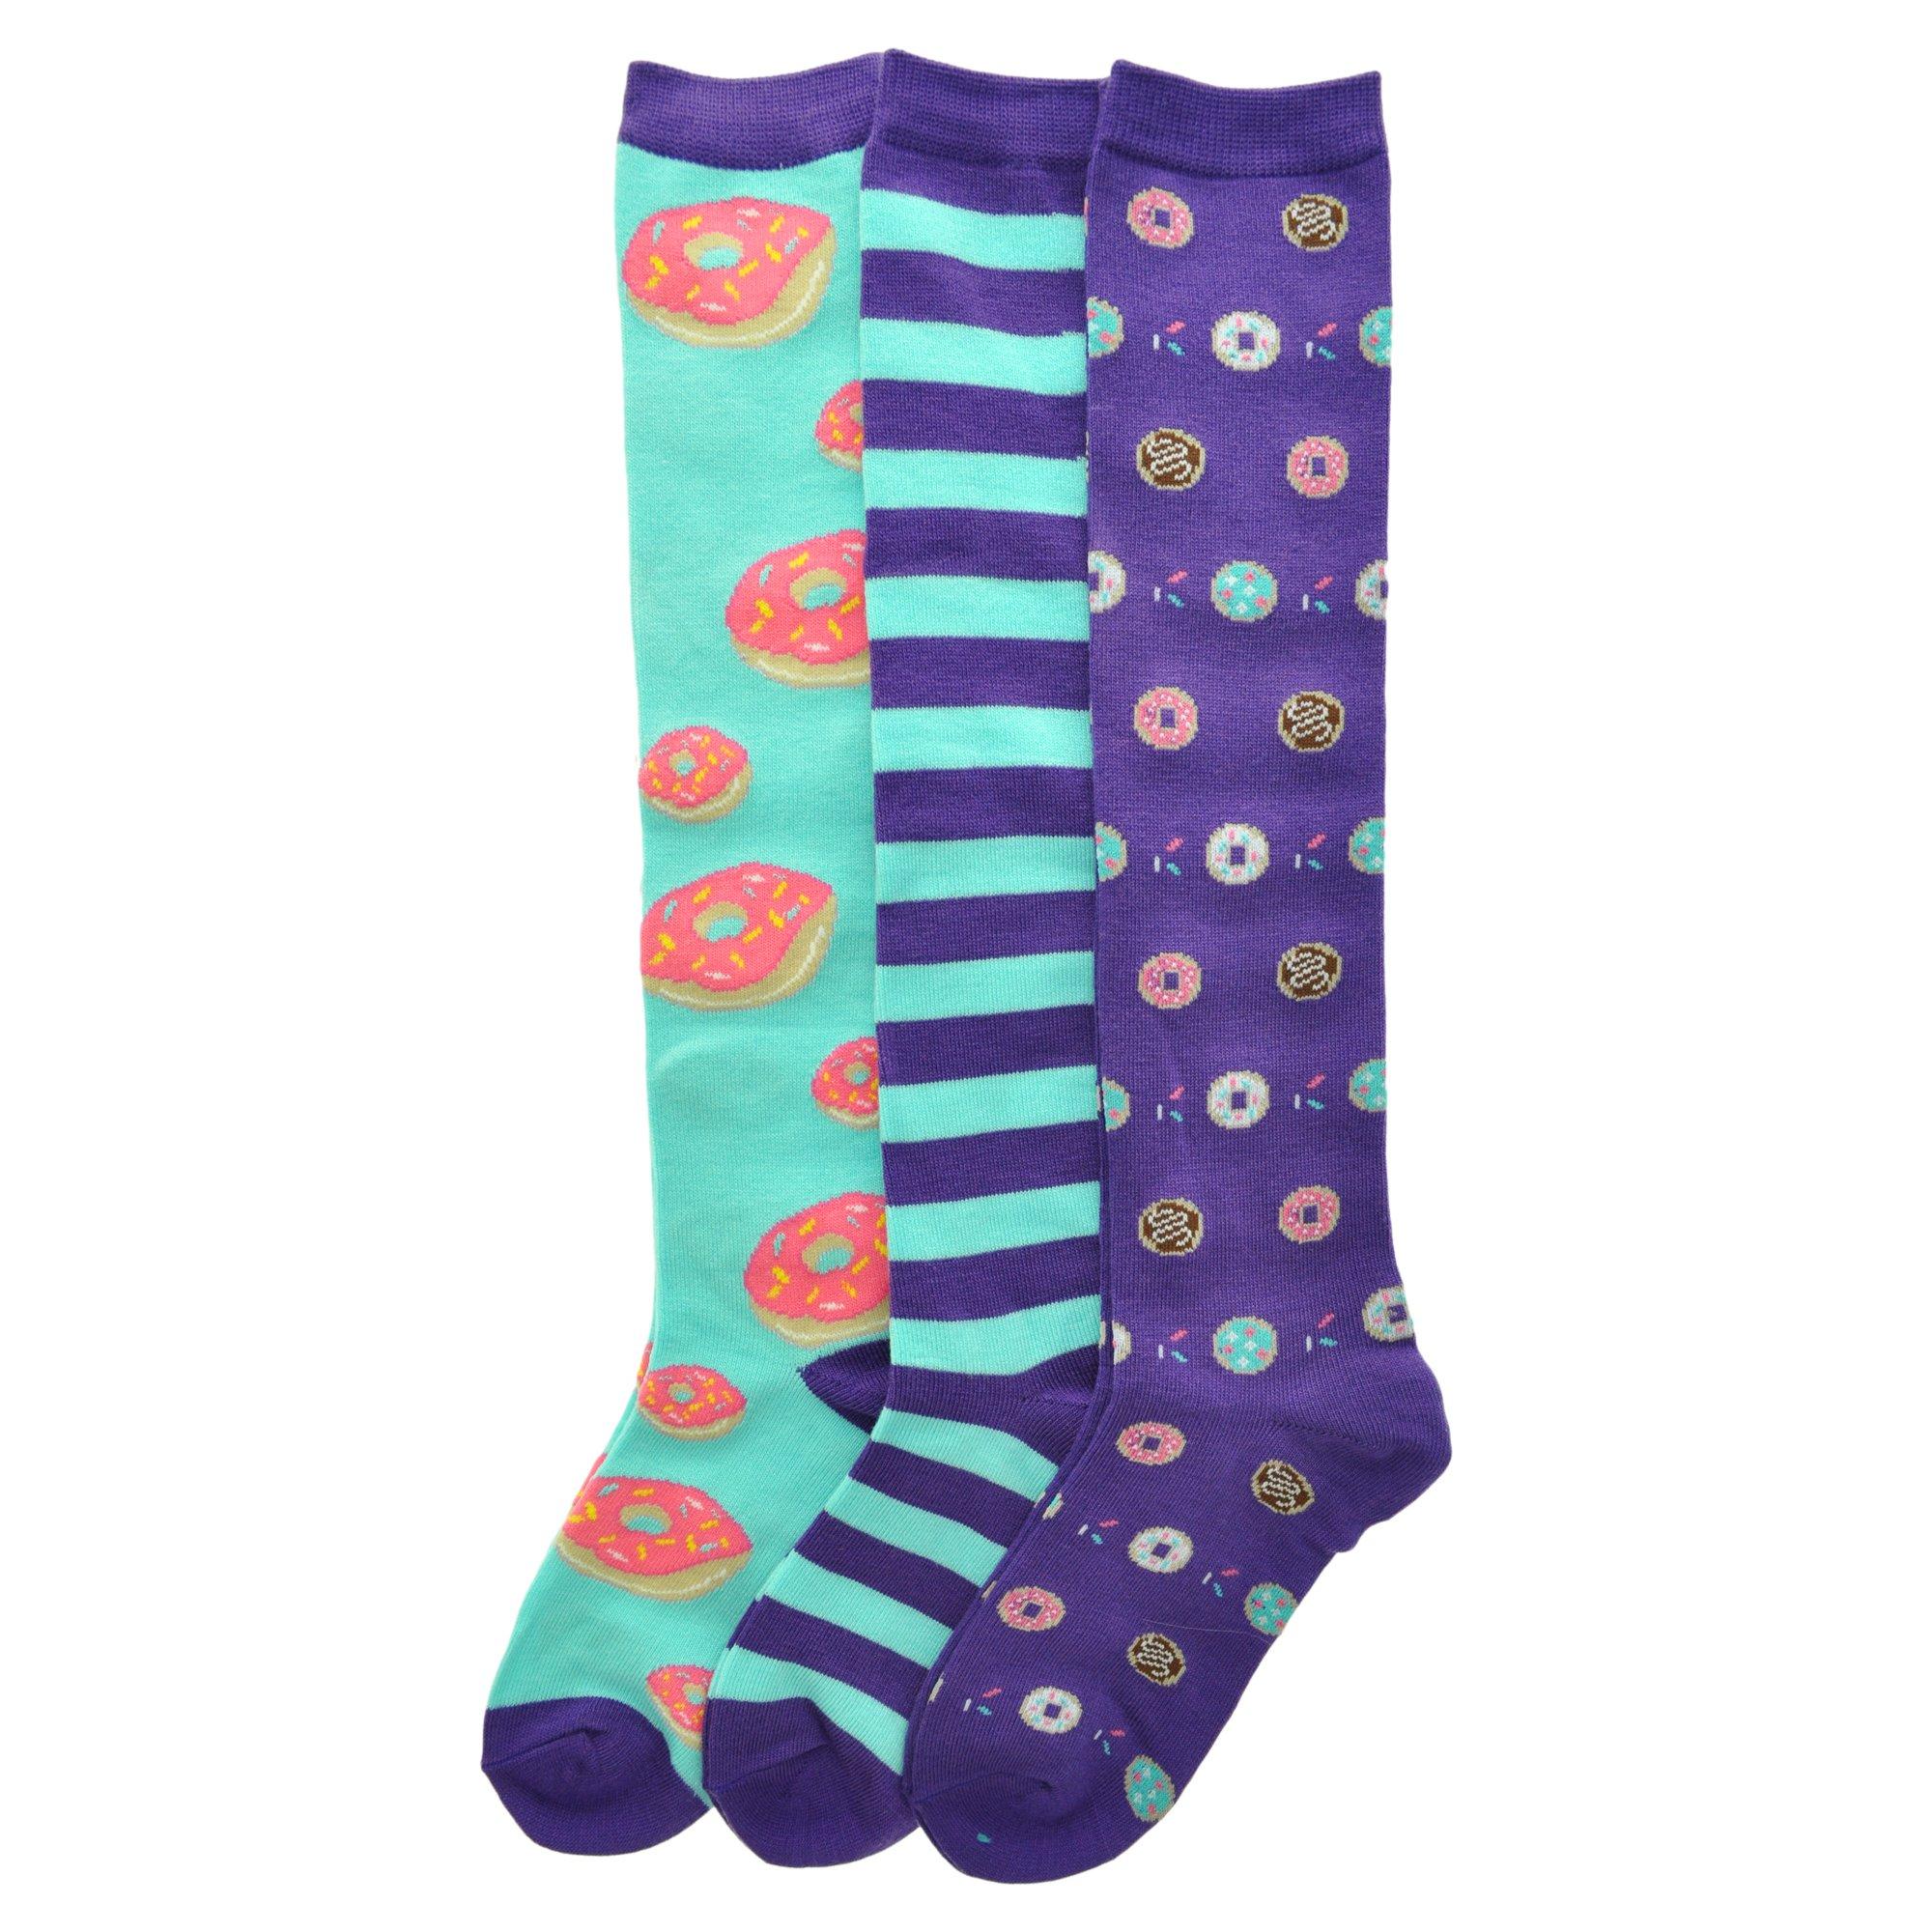 Angelina 3-Pack Adult Knee-length Novelty Donuts Socks, 2551_3_9-11 by Angelina